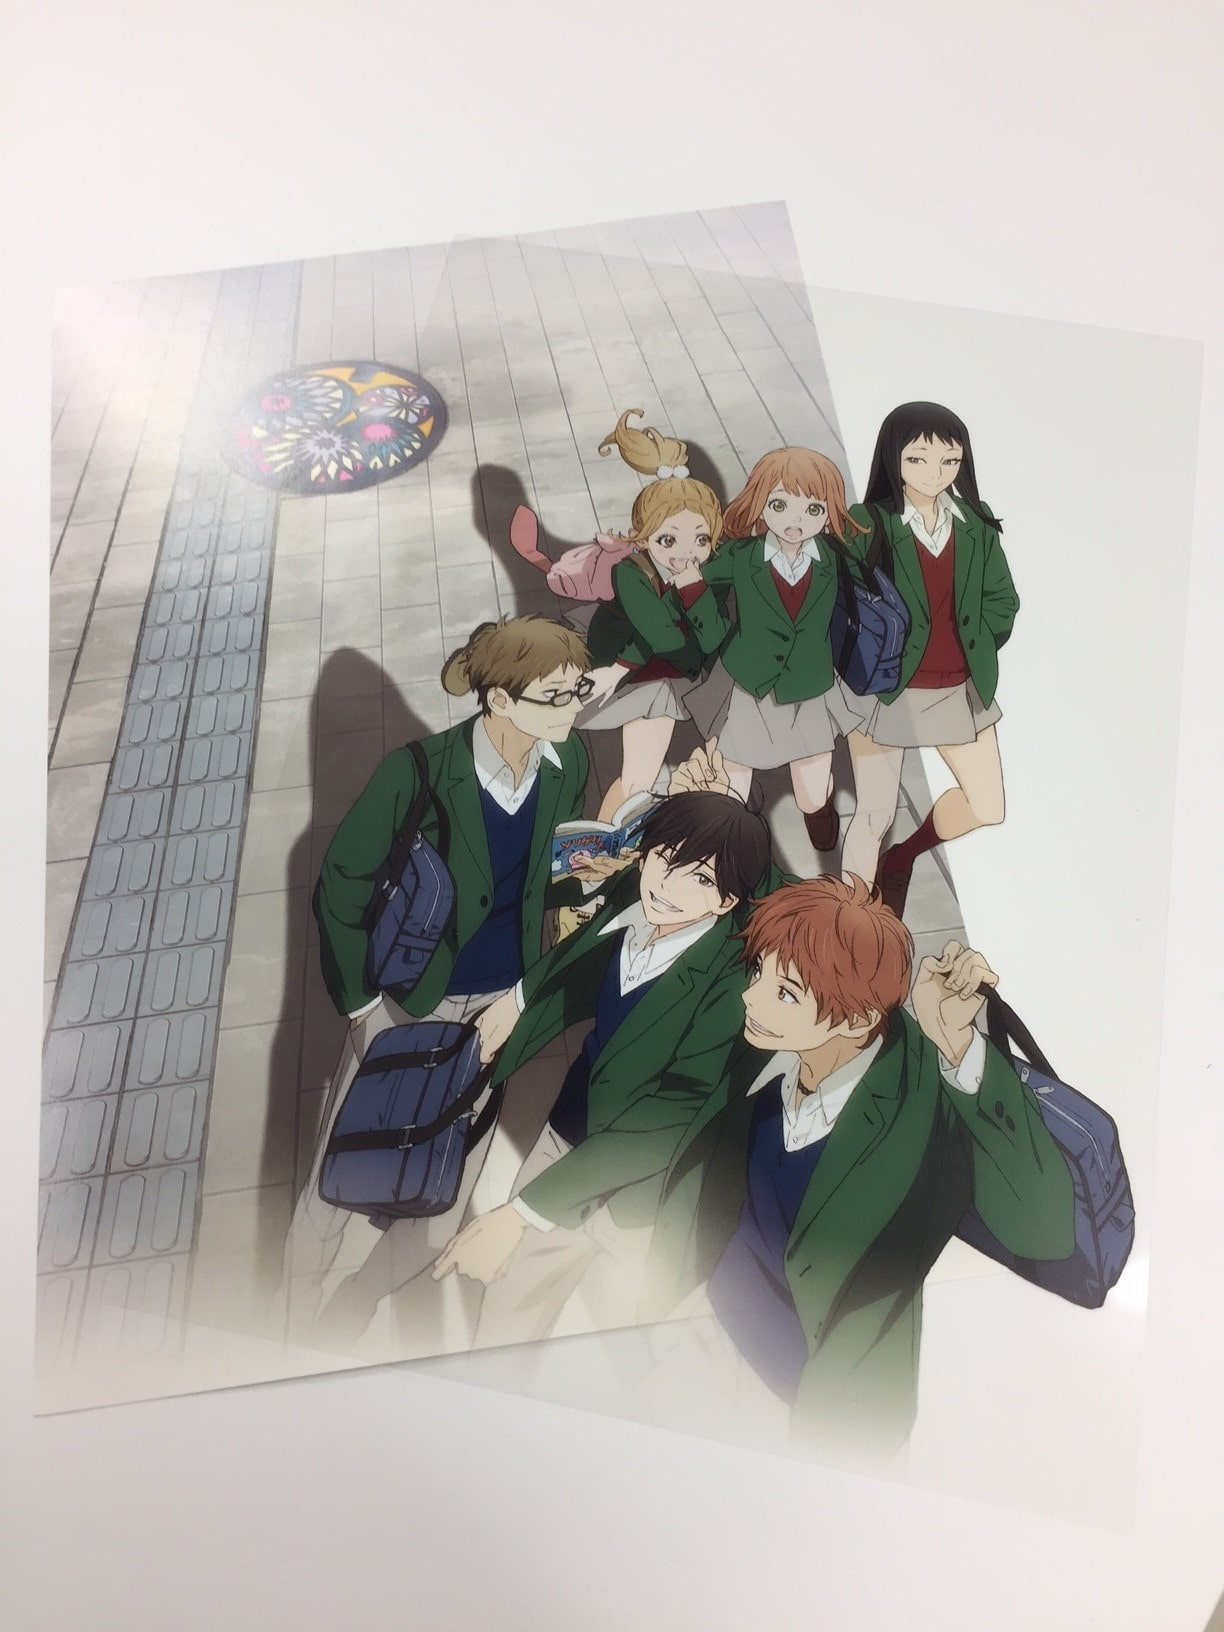 TVアニメ「orange」Vol.1 DVD 初回生産限定版